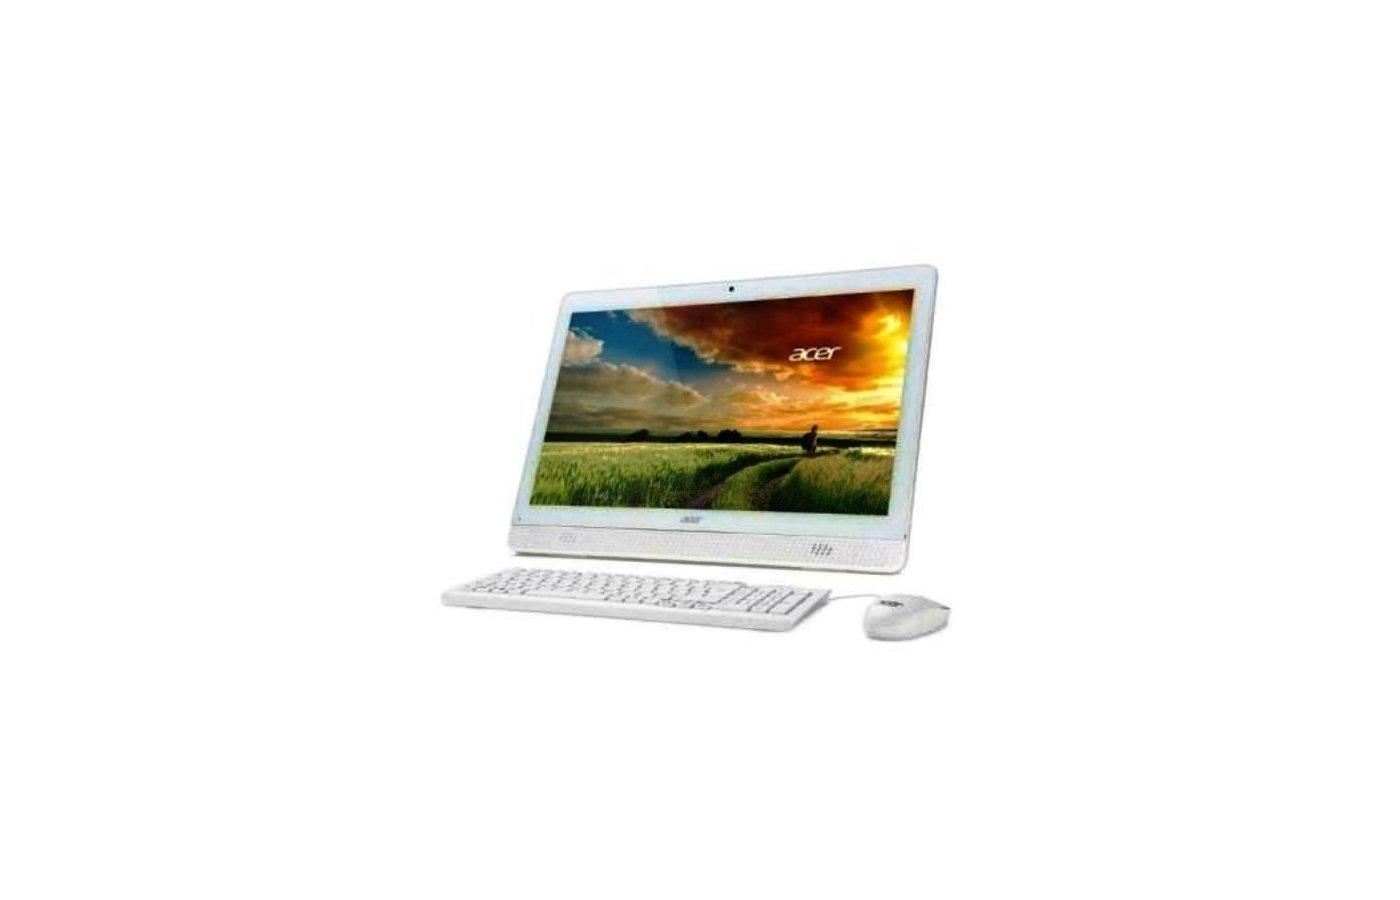 Моноблок Acer Aspire Z1-602 /DQ.B33ER.002/